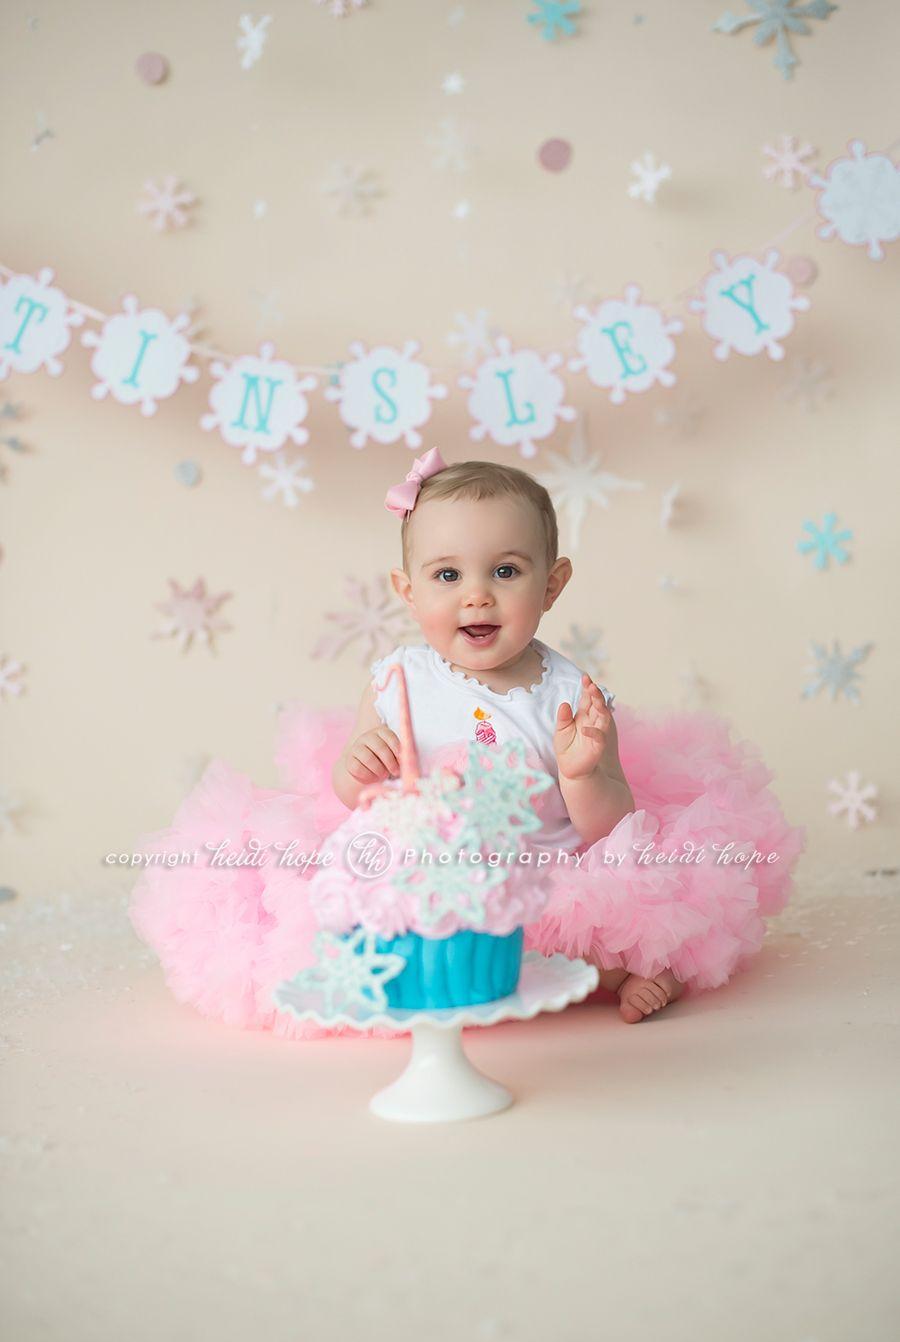 Firstbirthdaycakesmashphotographer Cake Smash - Cake smash first birthday